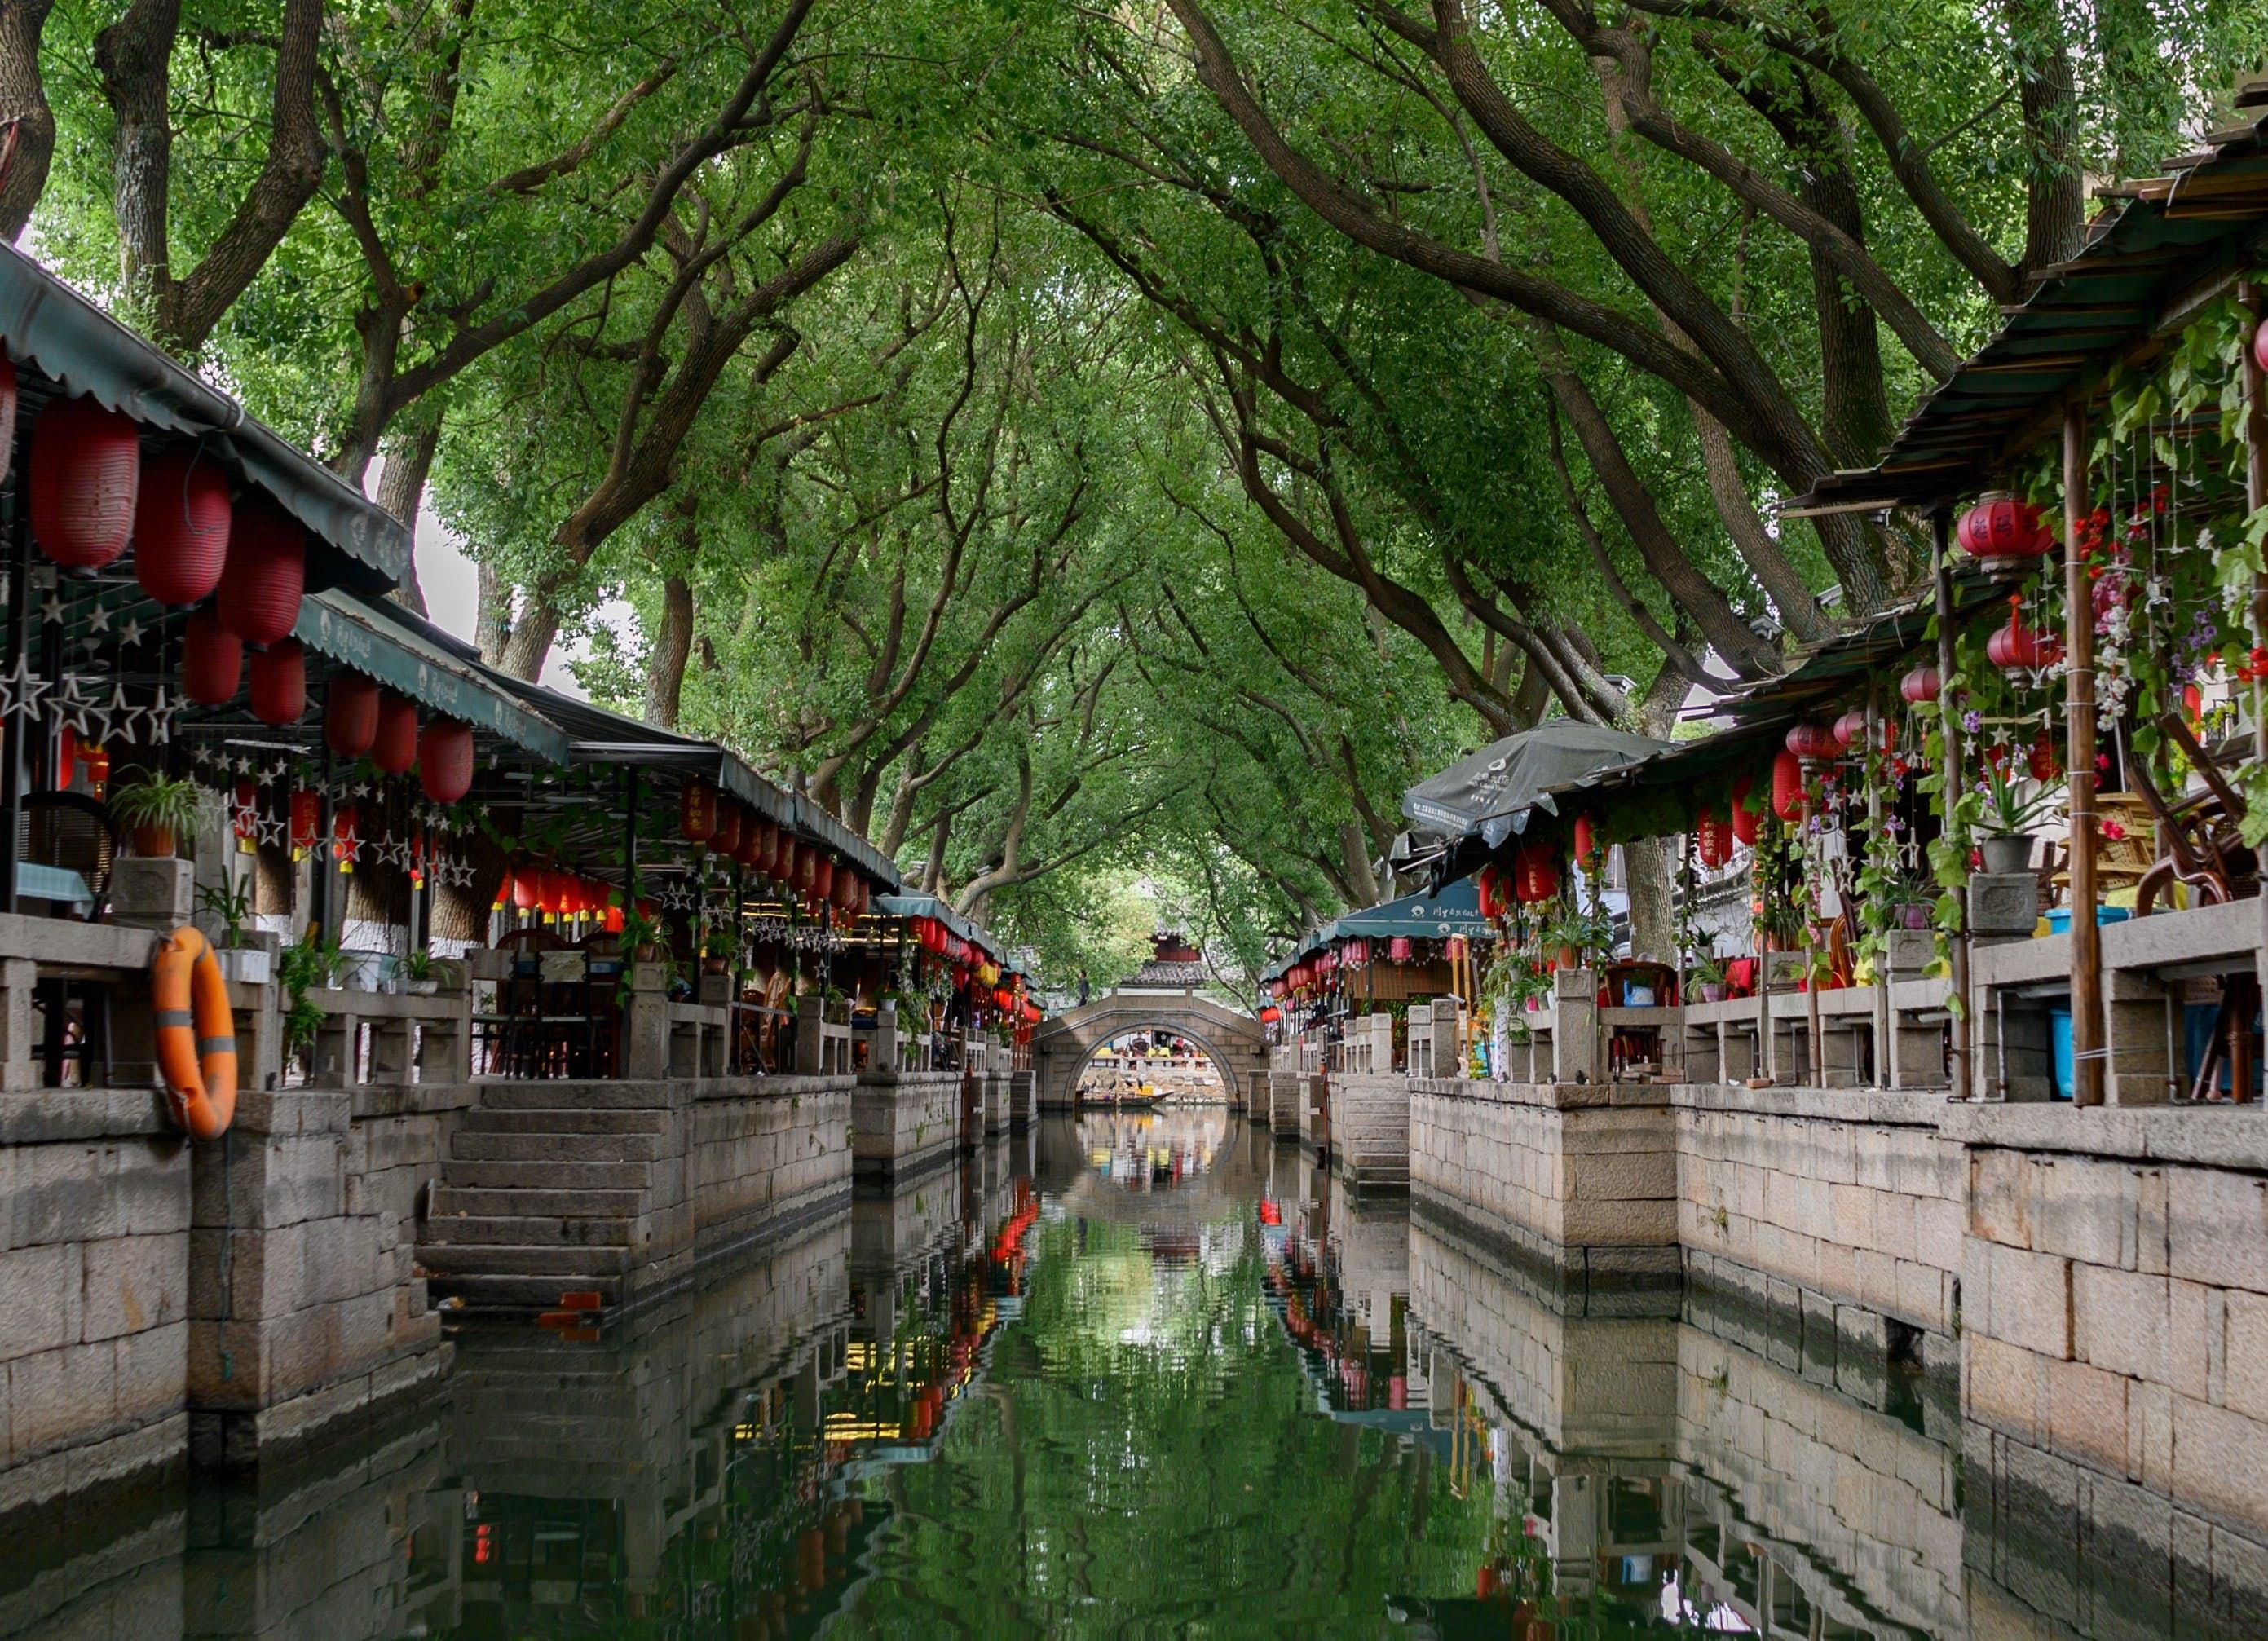 Sozhou, grad sa najlepšim baštama na svetu - Page 3 Original_JoeSills_Suzhou_Tongli_Canals%20%282%29